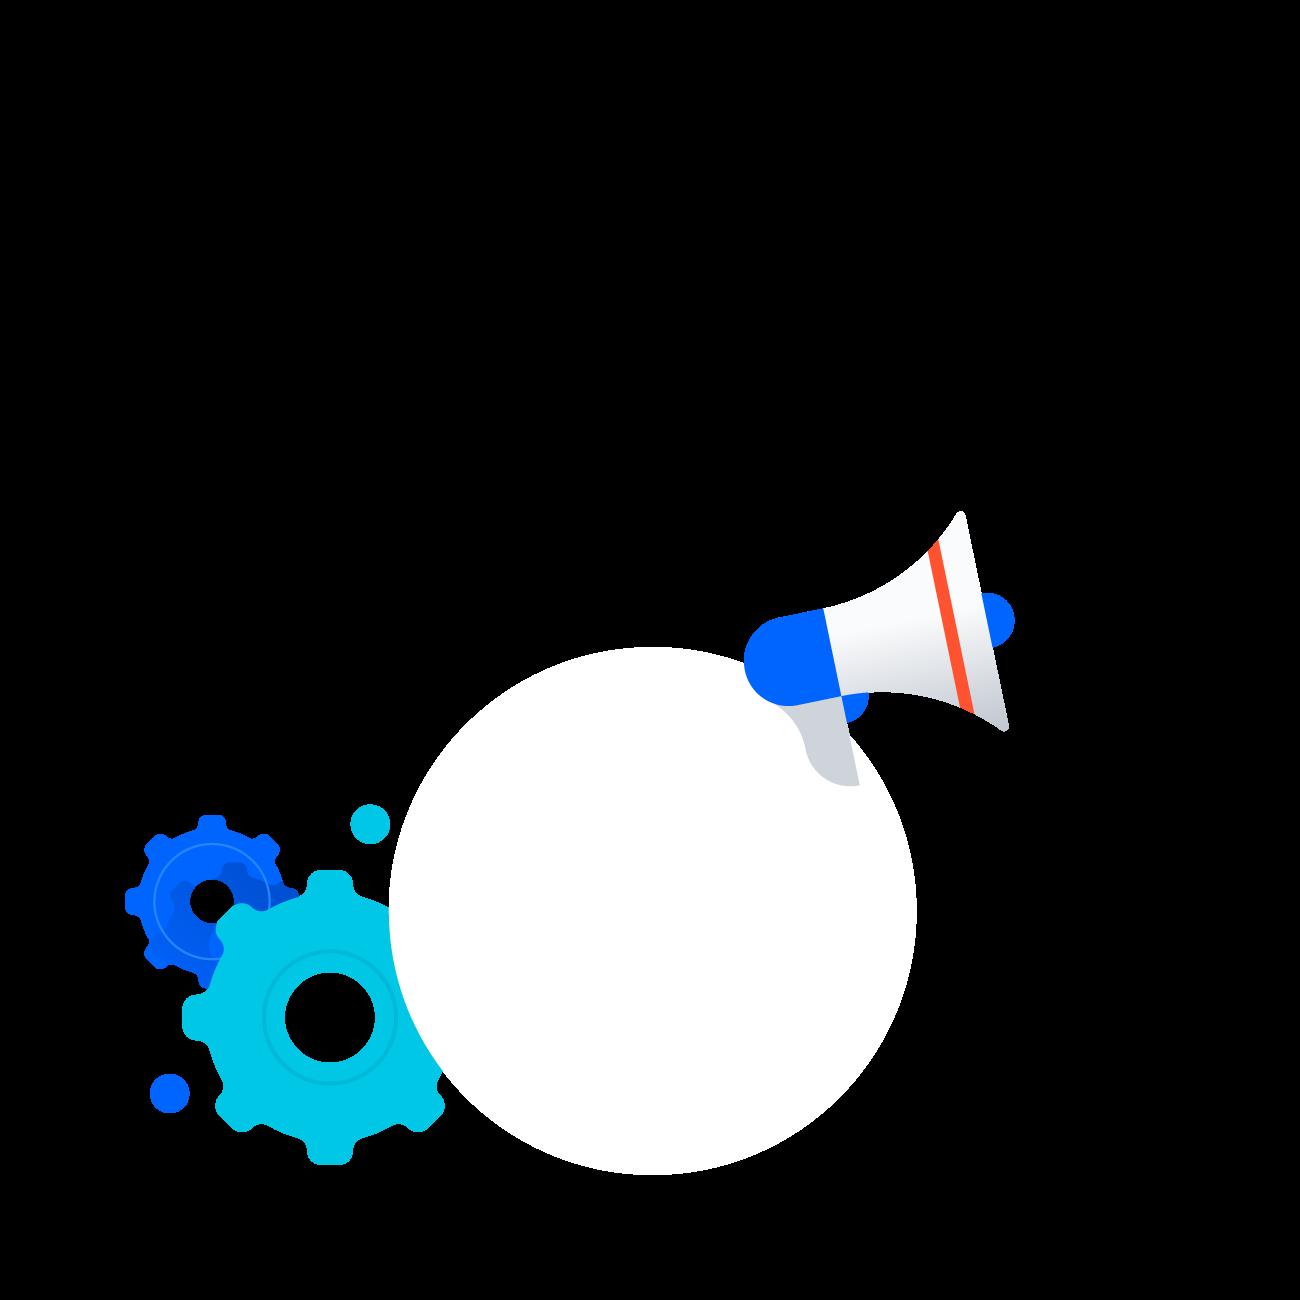 10 Years of Git